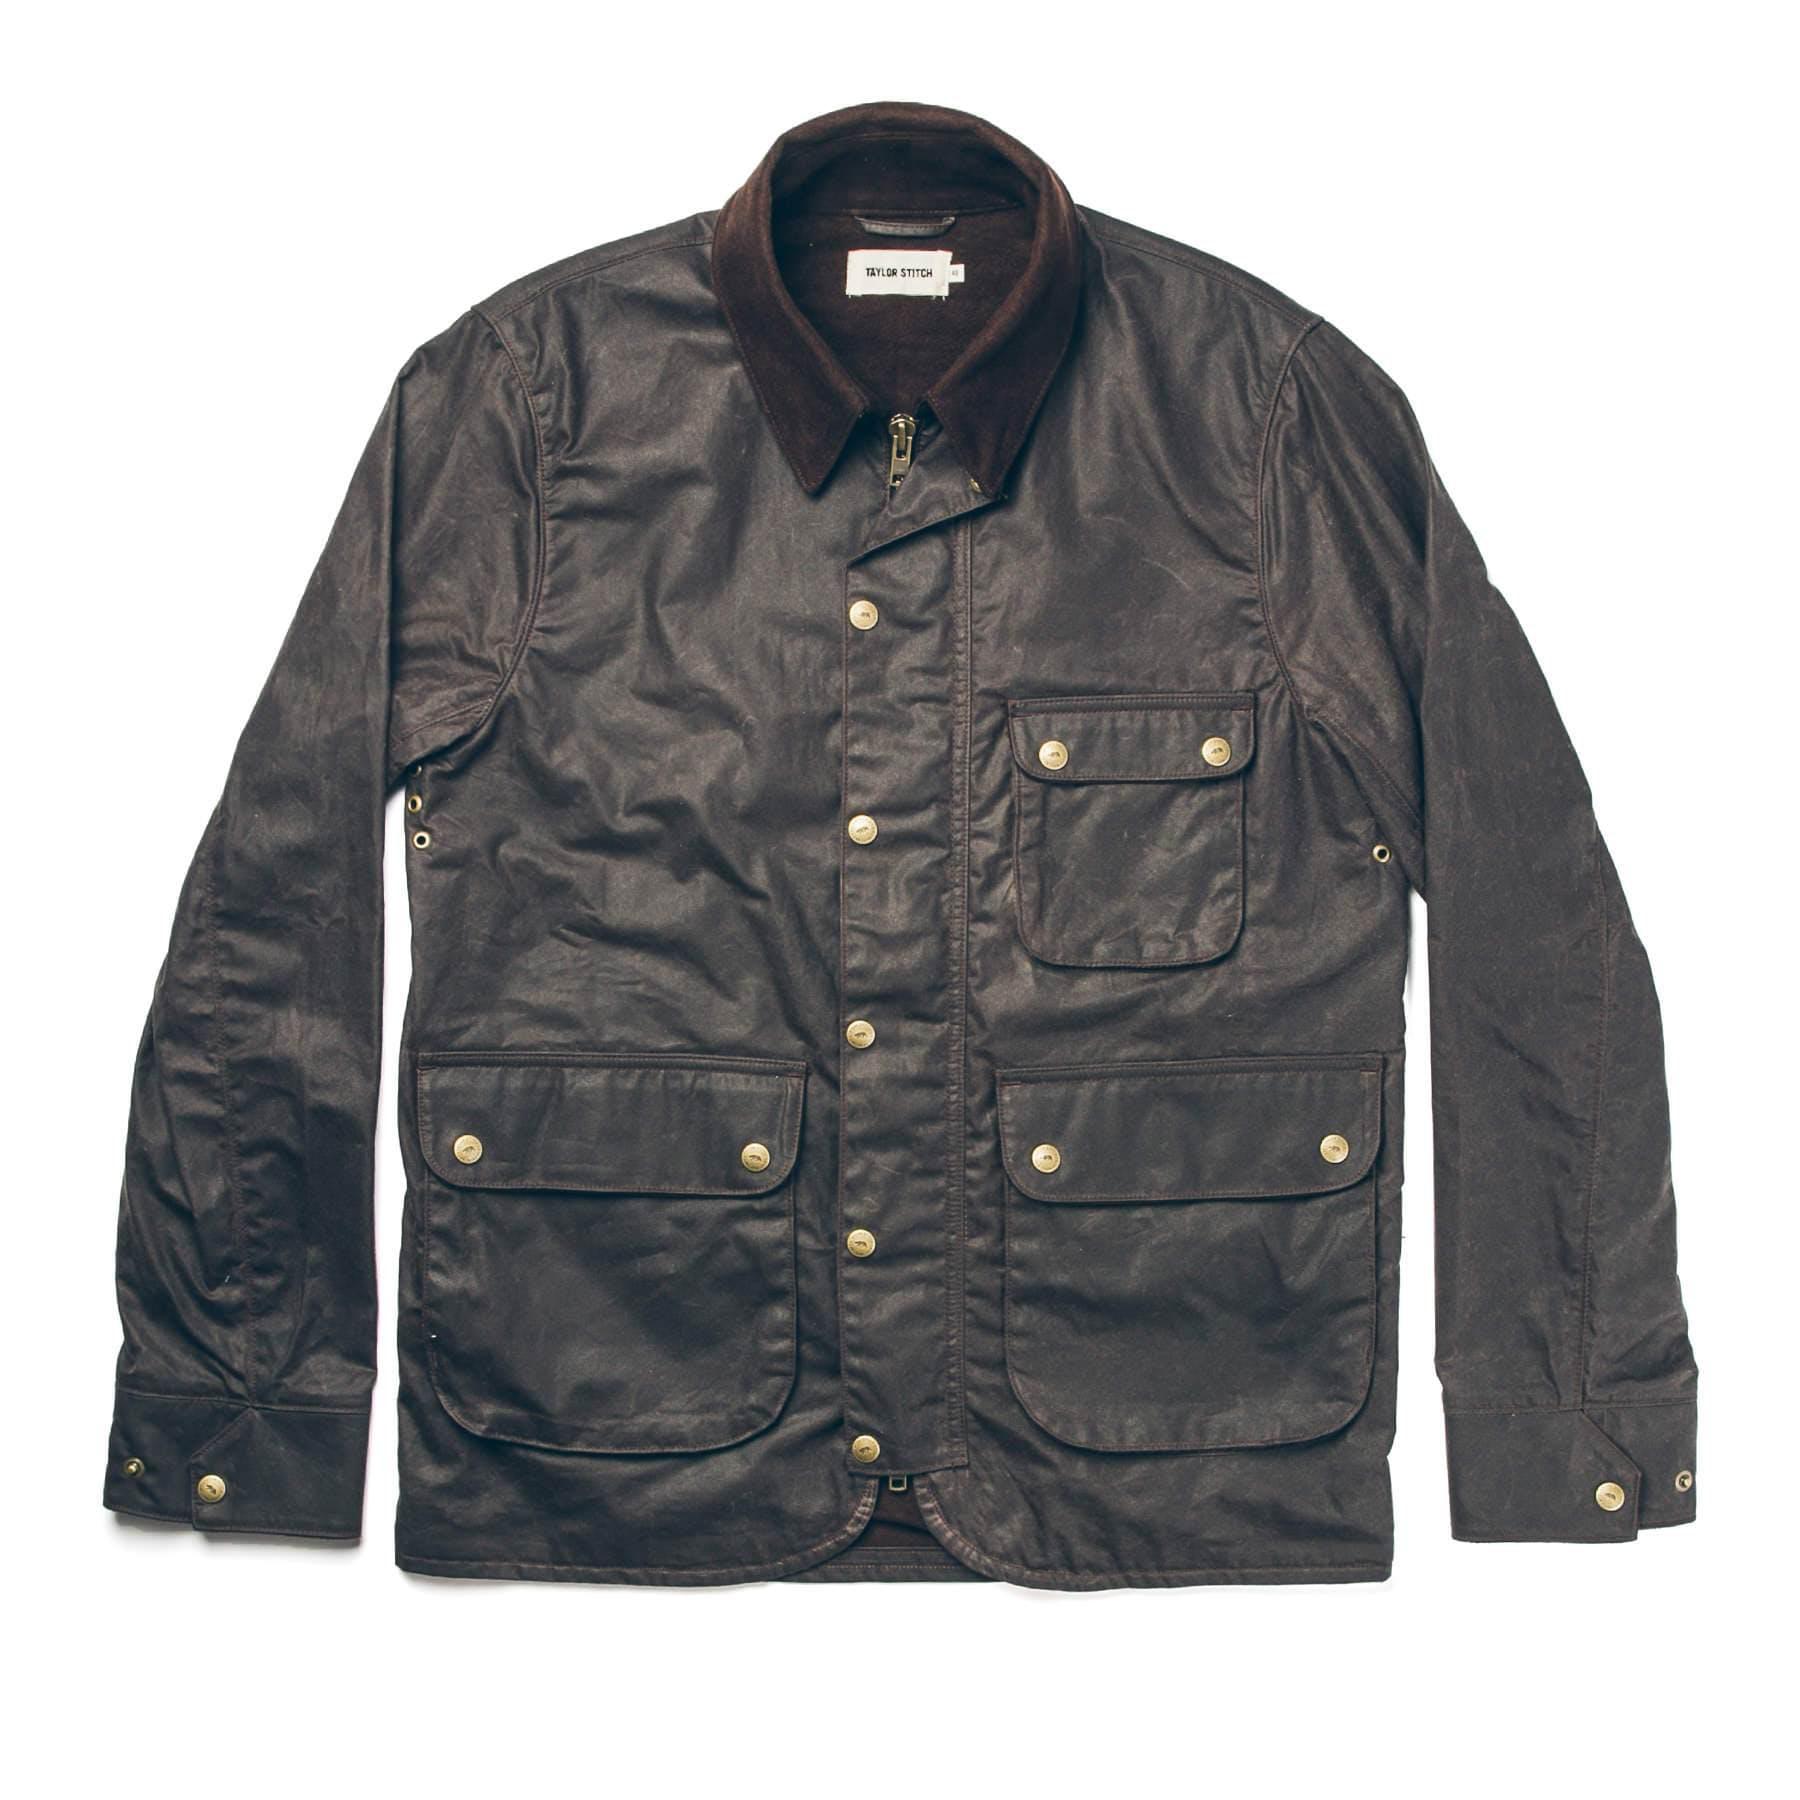 Eglk6miflq taylor stitch the rover jacket 0 original